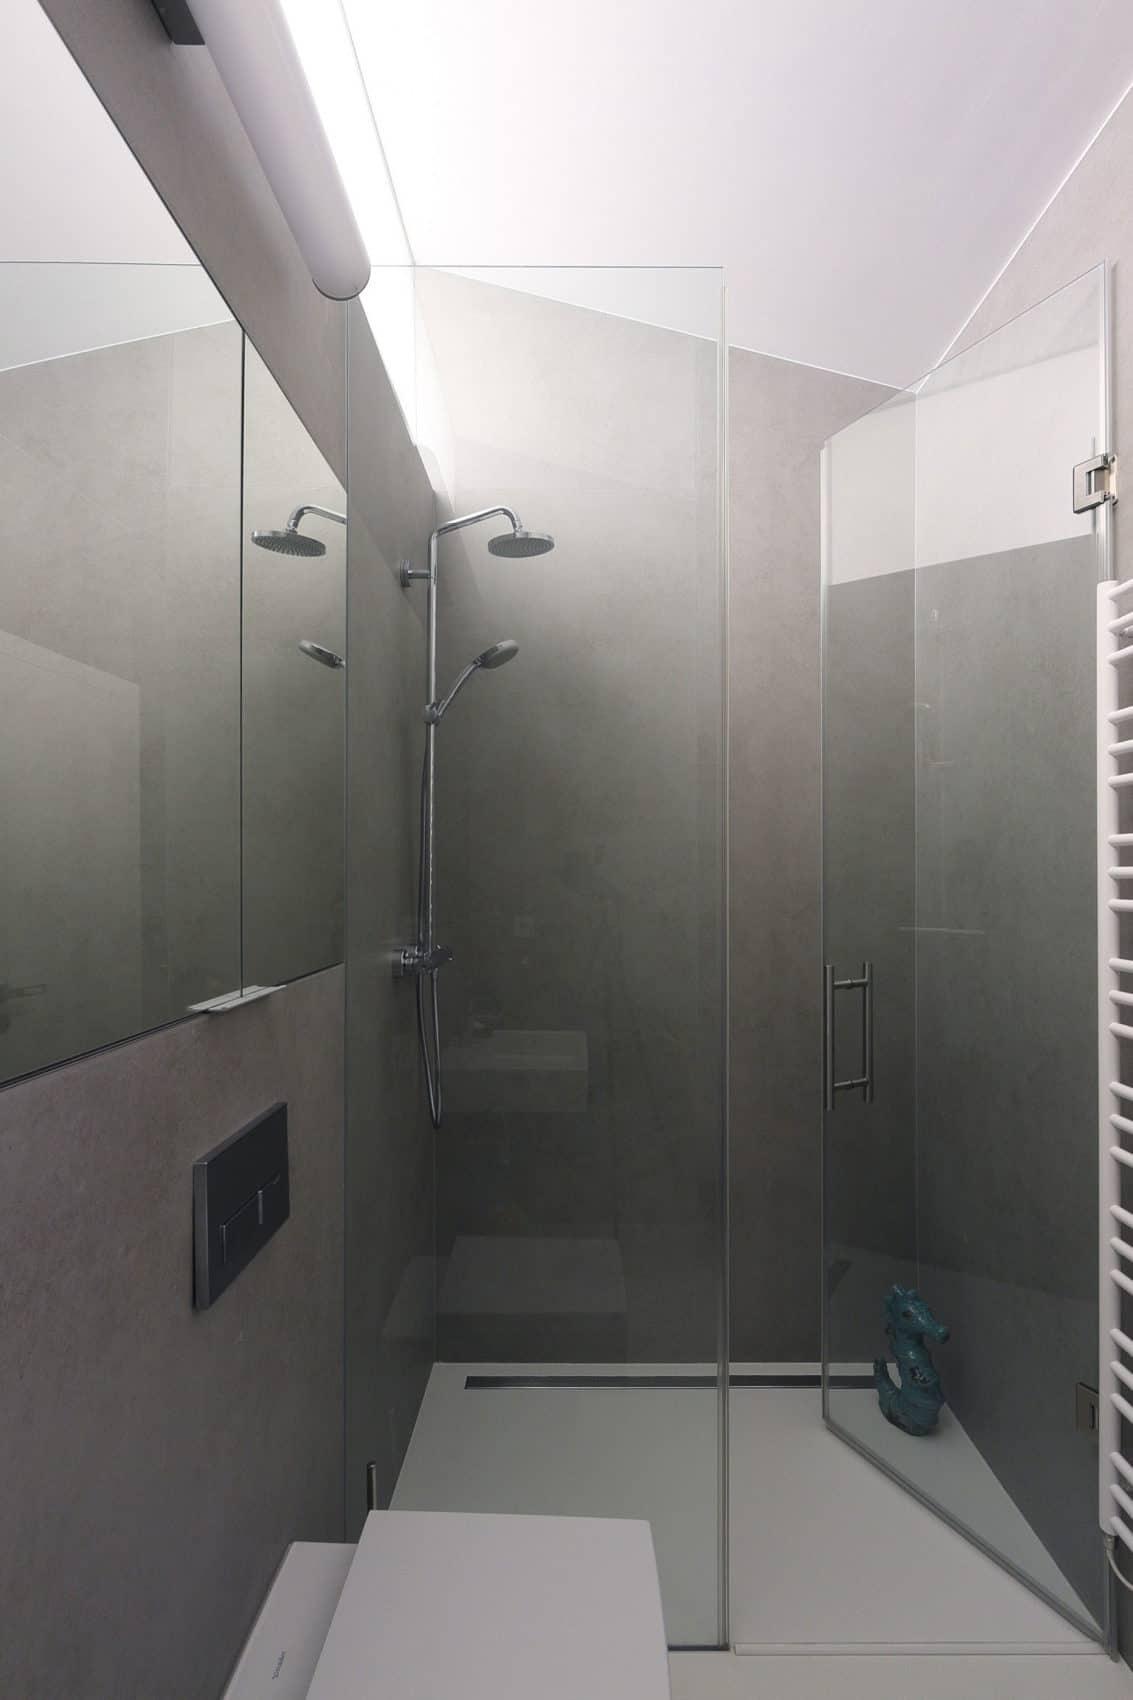 House K2 by Pauliny Hovorka Architekti (19)